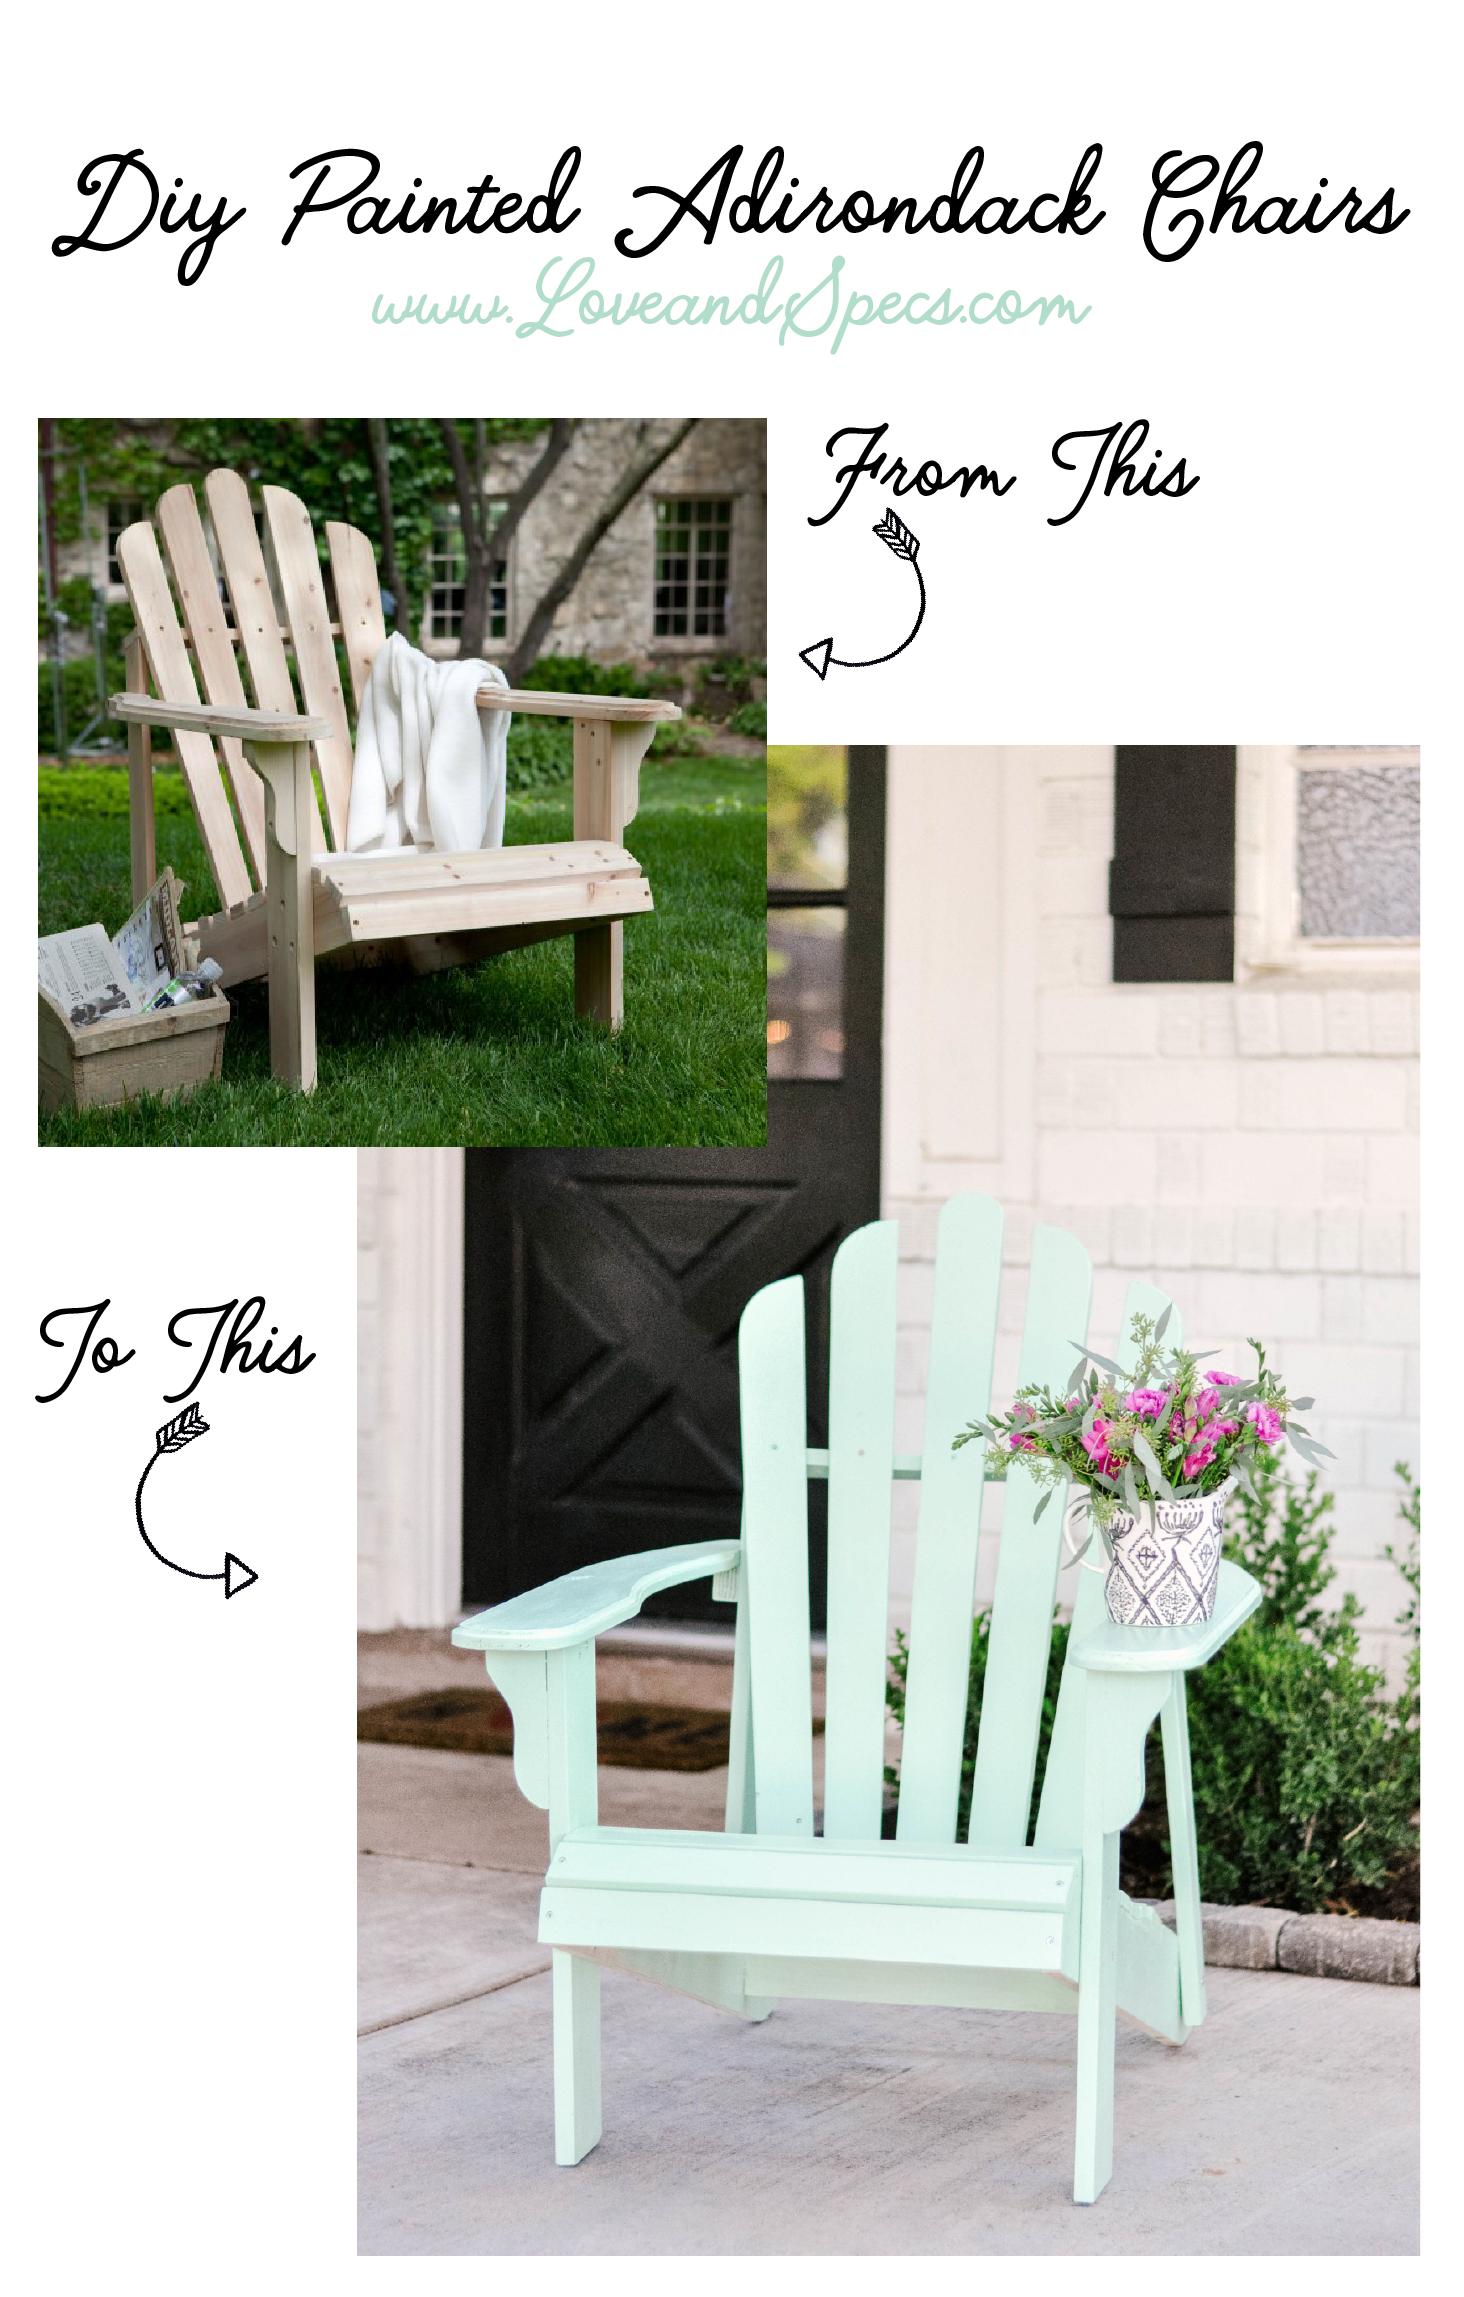 DIY-painted-adirondack-chairs.jpeg